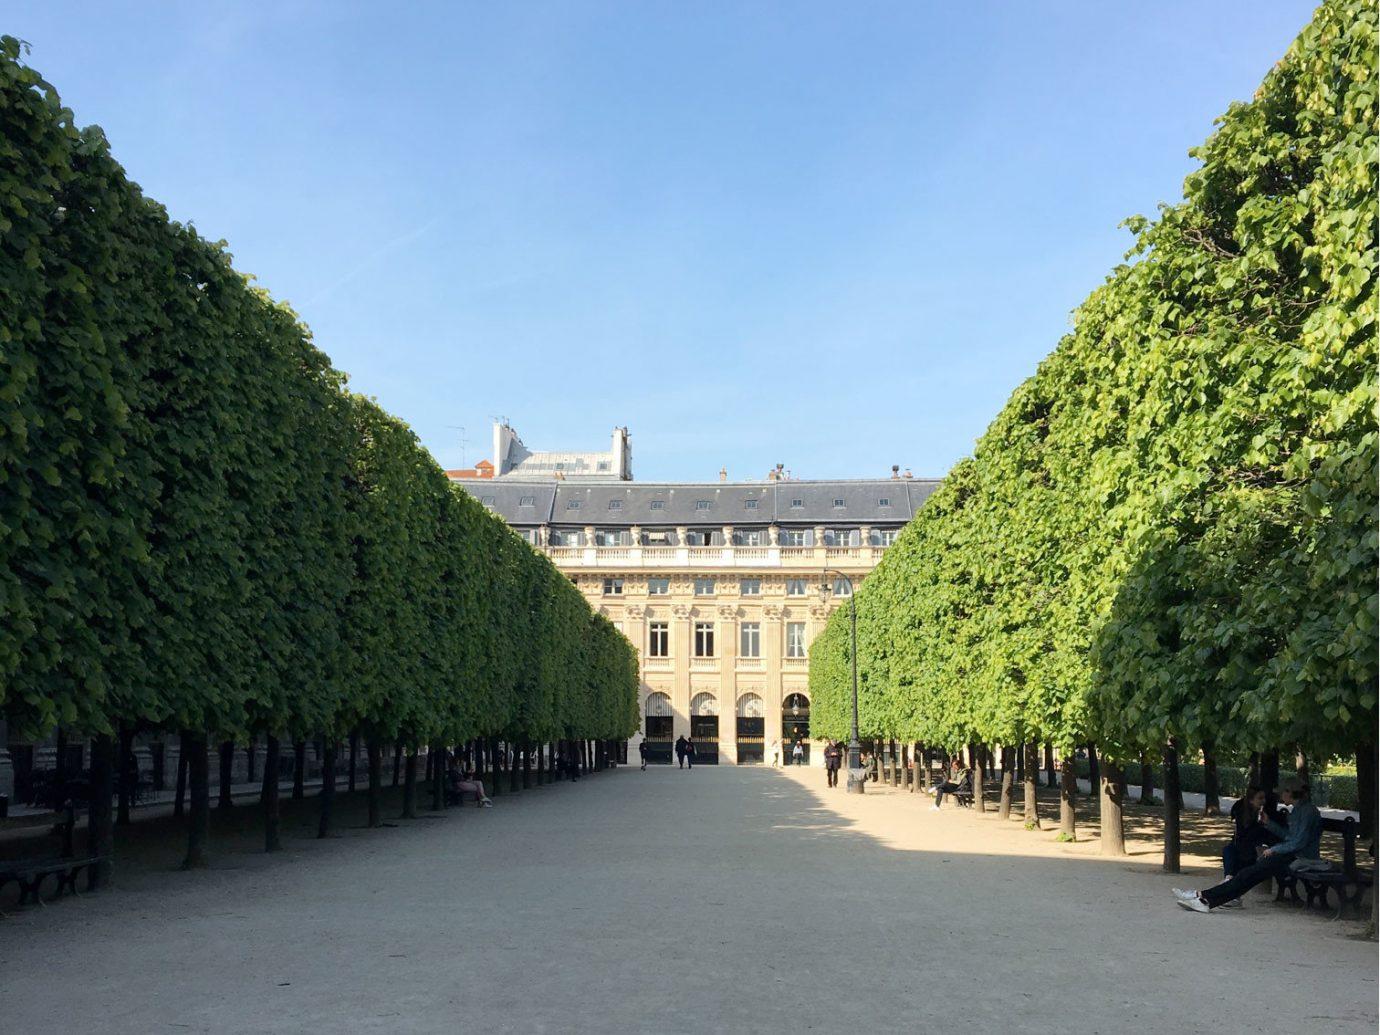 France Paris Trip Ideas outdoor sky tree green Architecture château estate tourism woody plant plant palace Garden town square